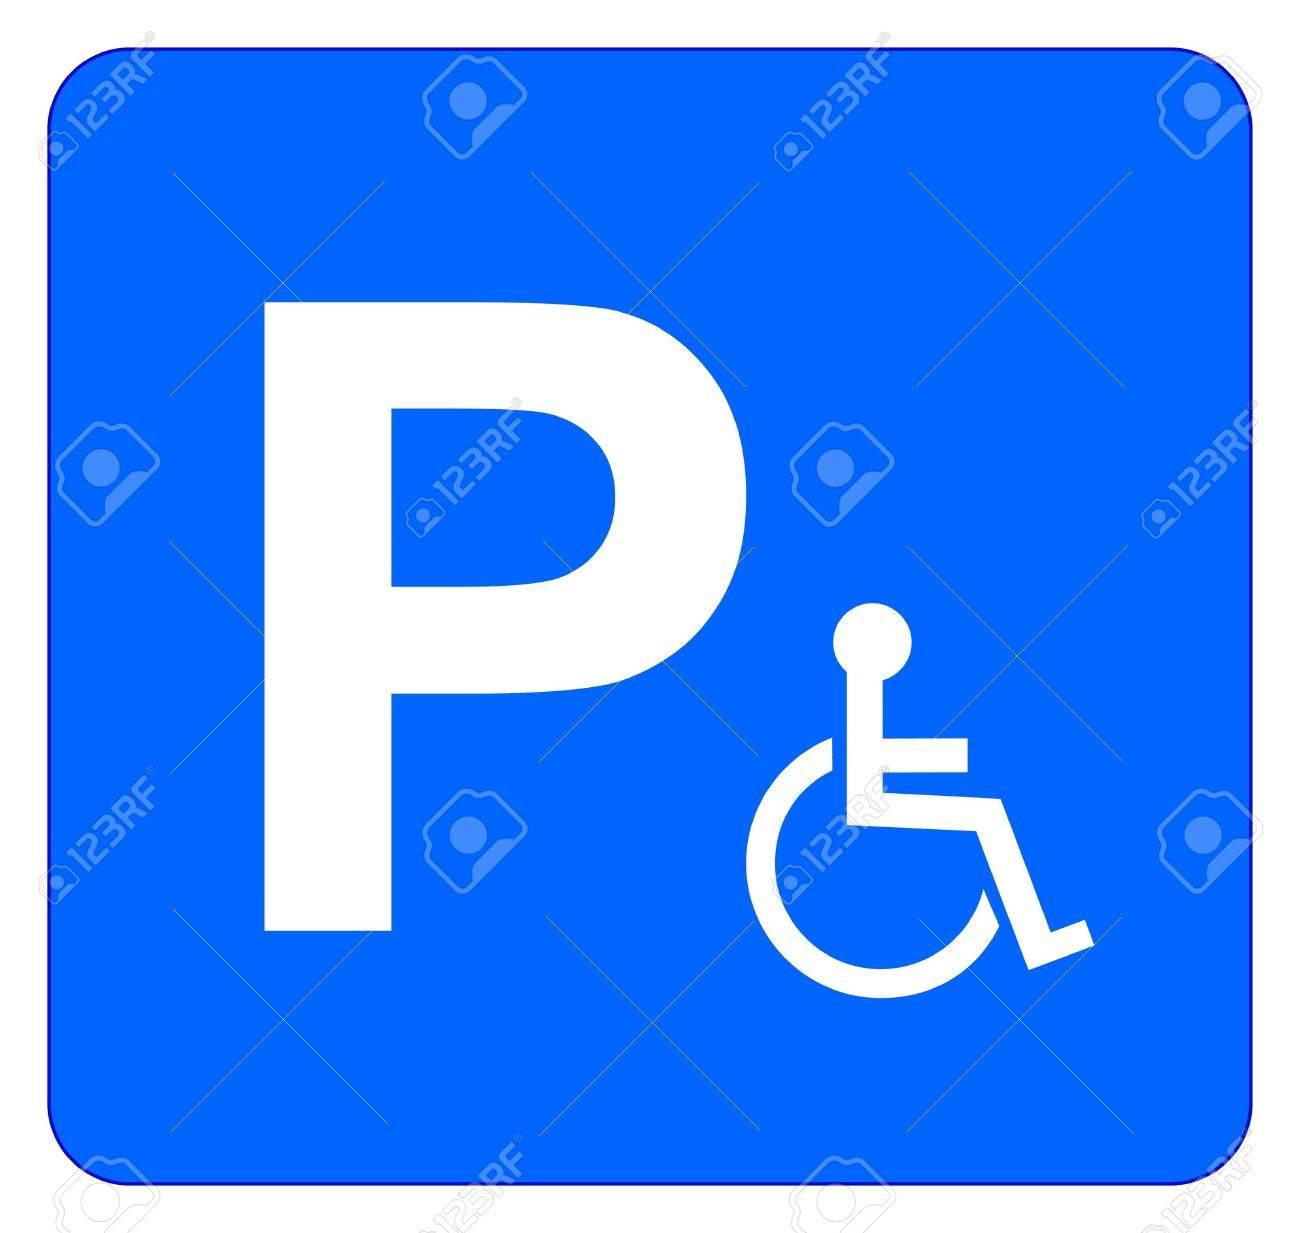 Illustration of parking sign for disabled people isolated on illustration of parking sign for disabled people isolated on white stock vector 18625347 buycottarizona